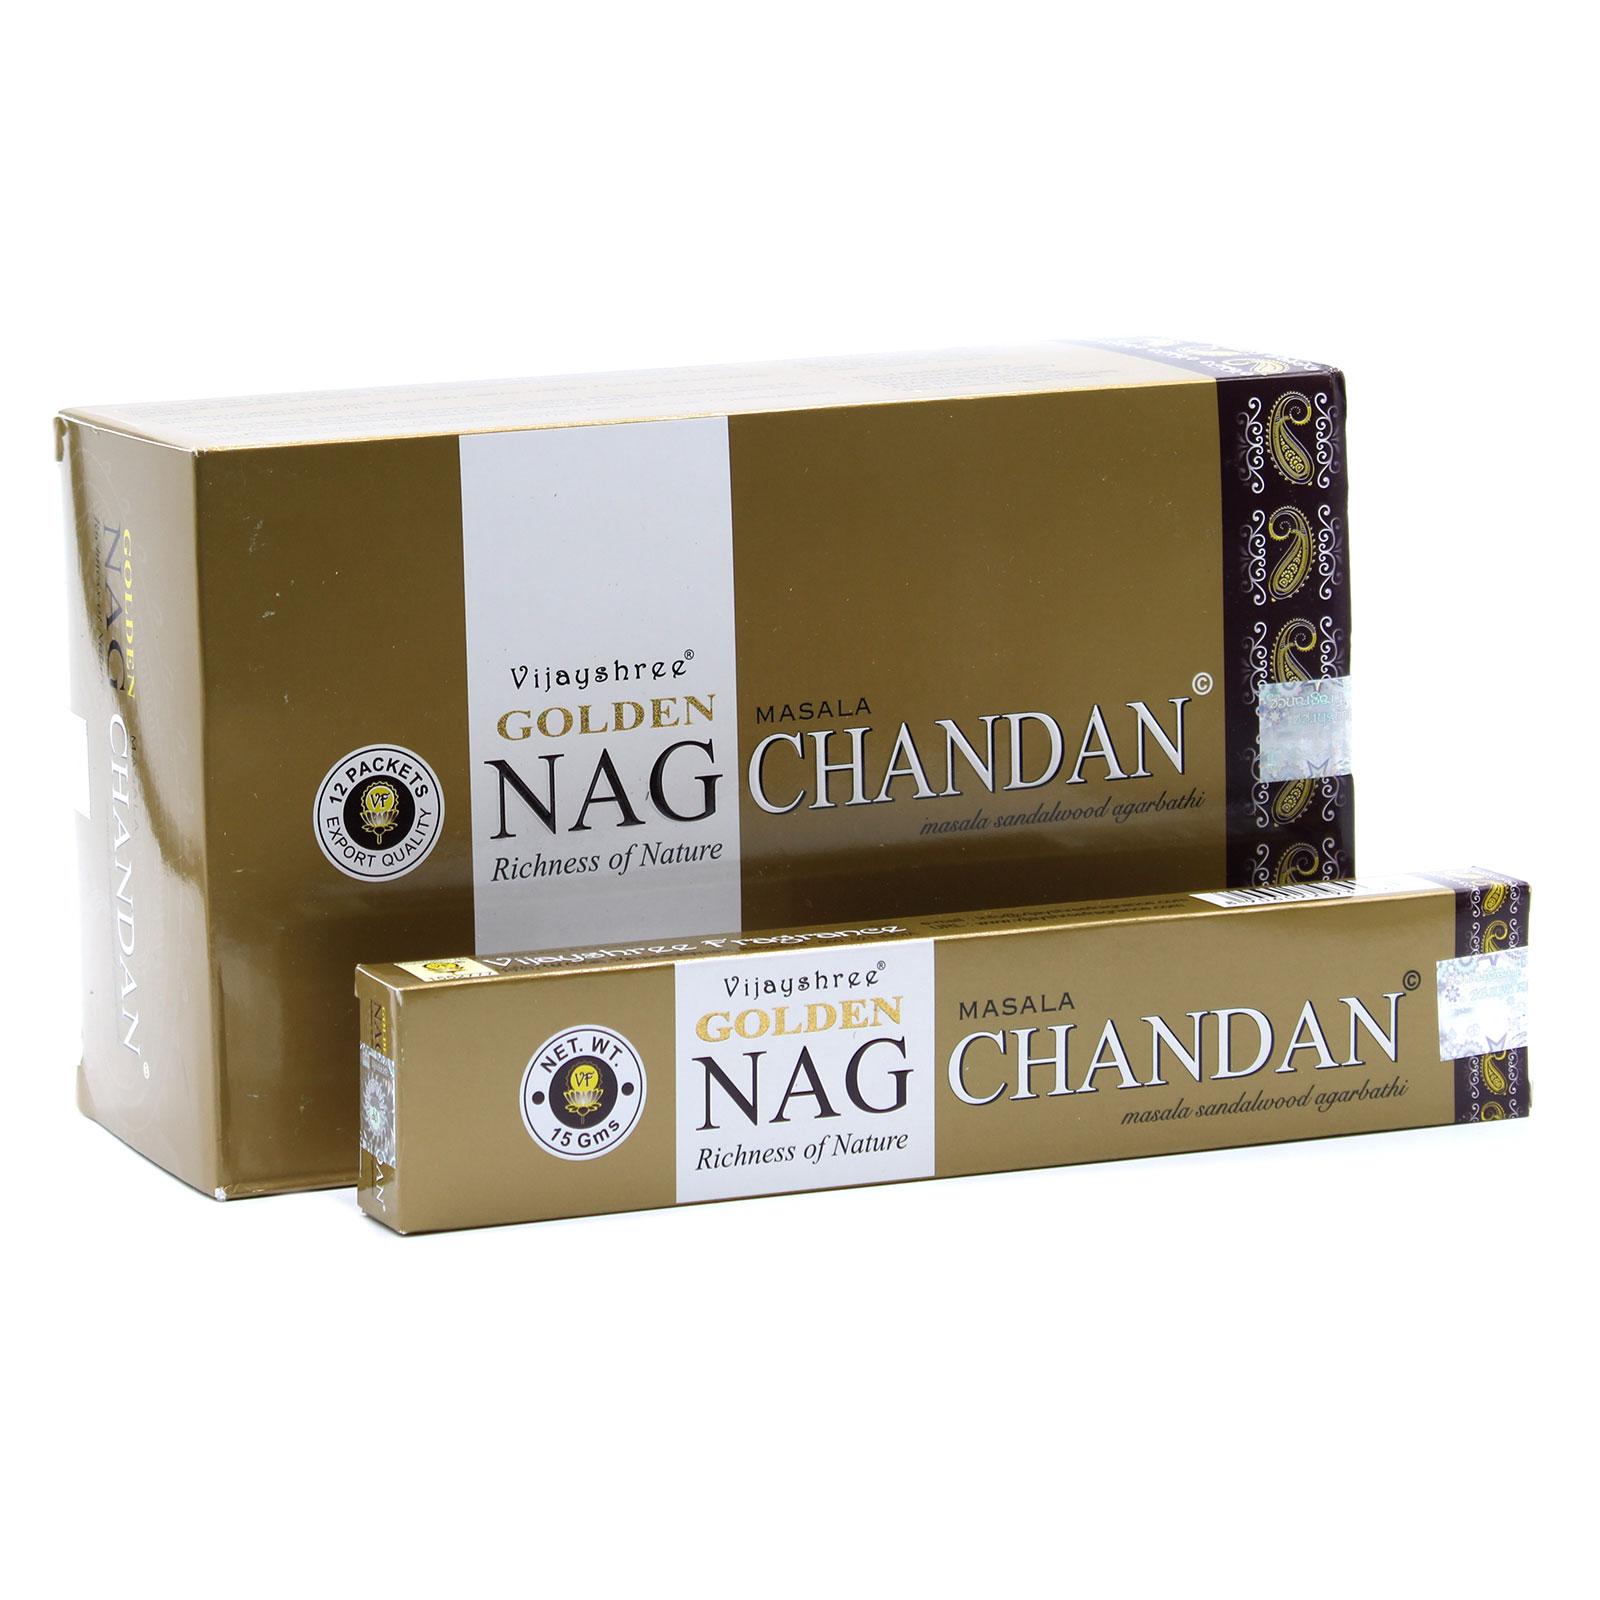 15g Golden Nag Chandan Incense